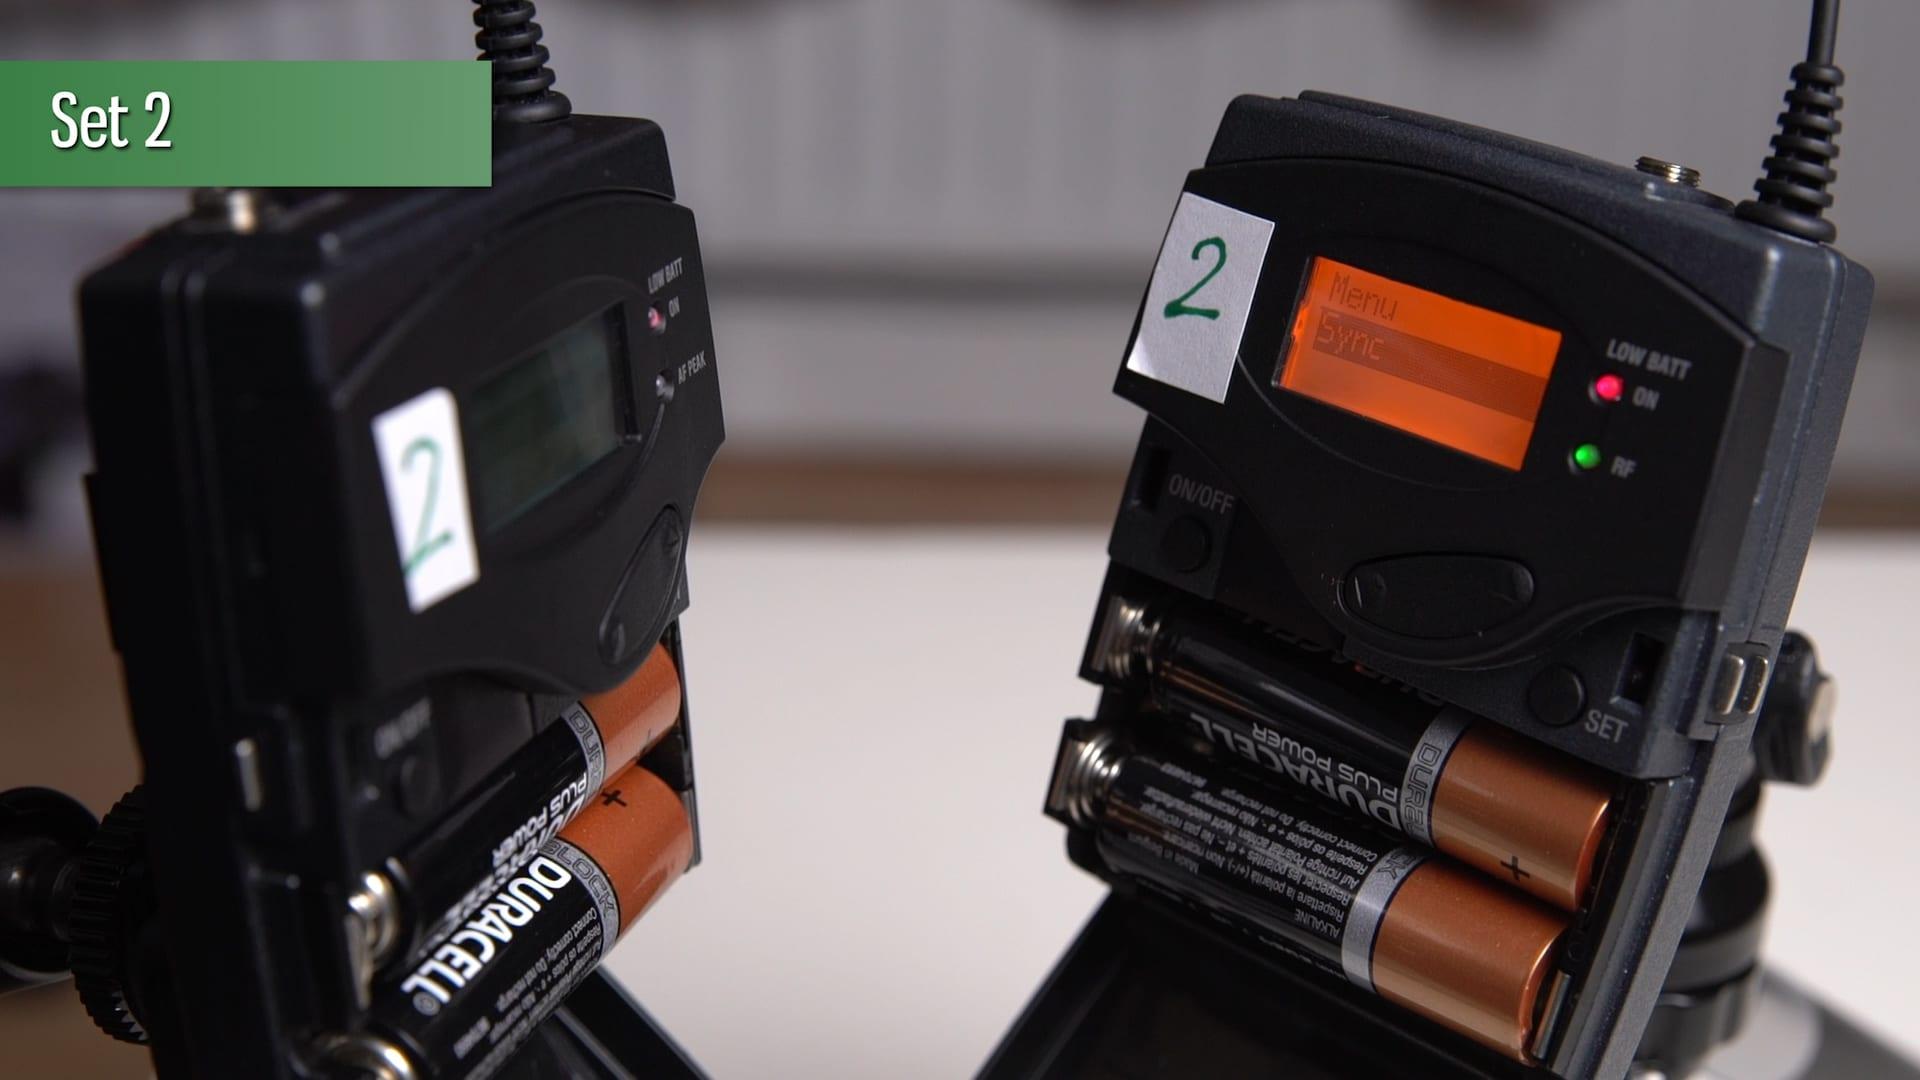 wo-senheissers-zoom-h4n-sync-checkmark-green-light-set-2